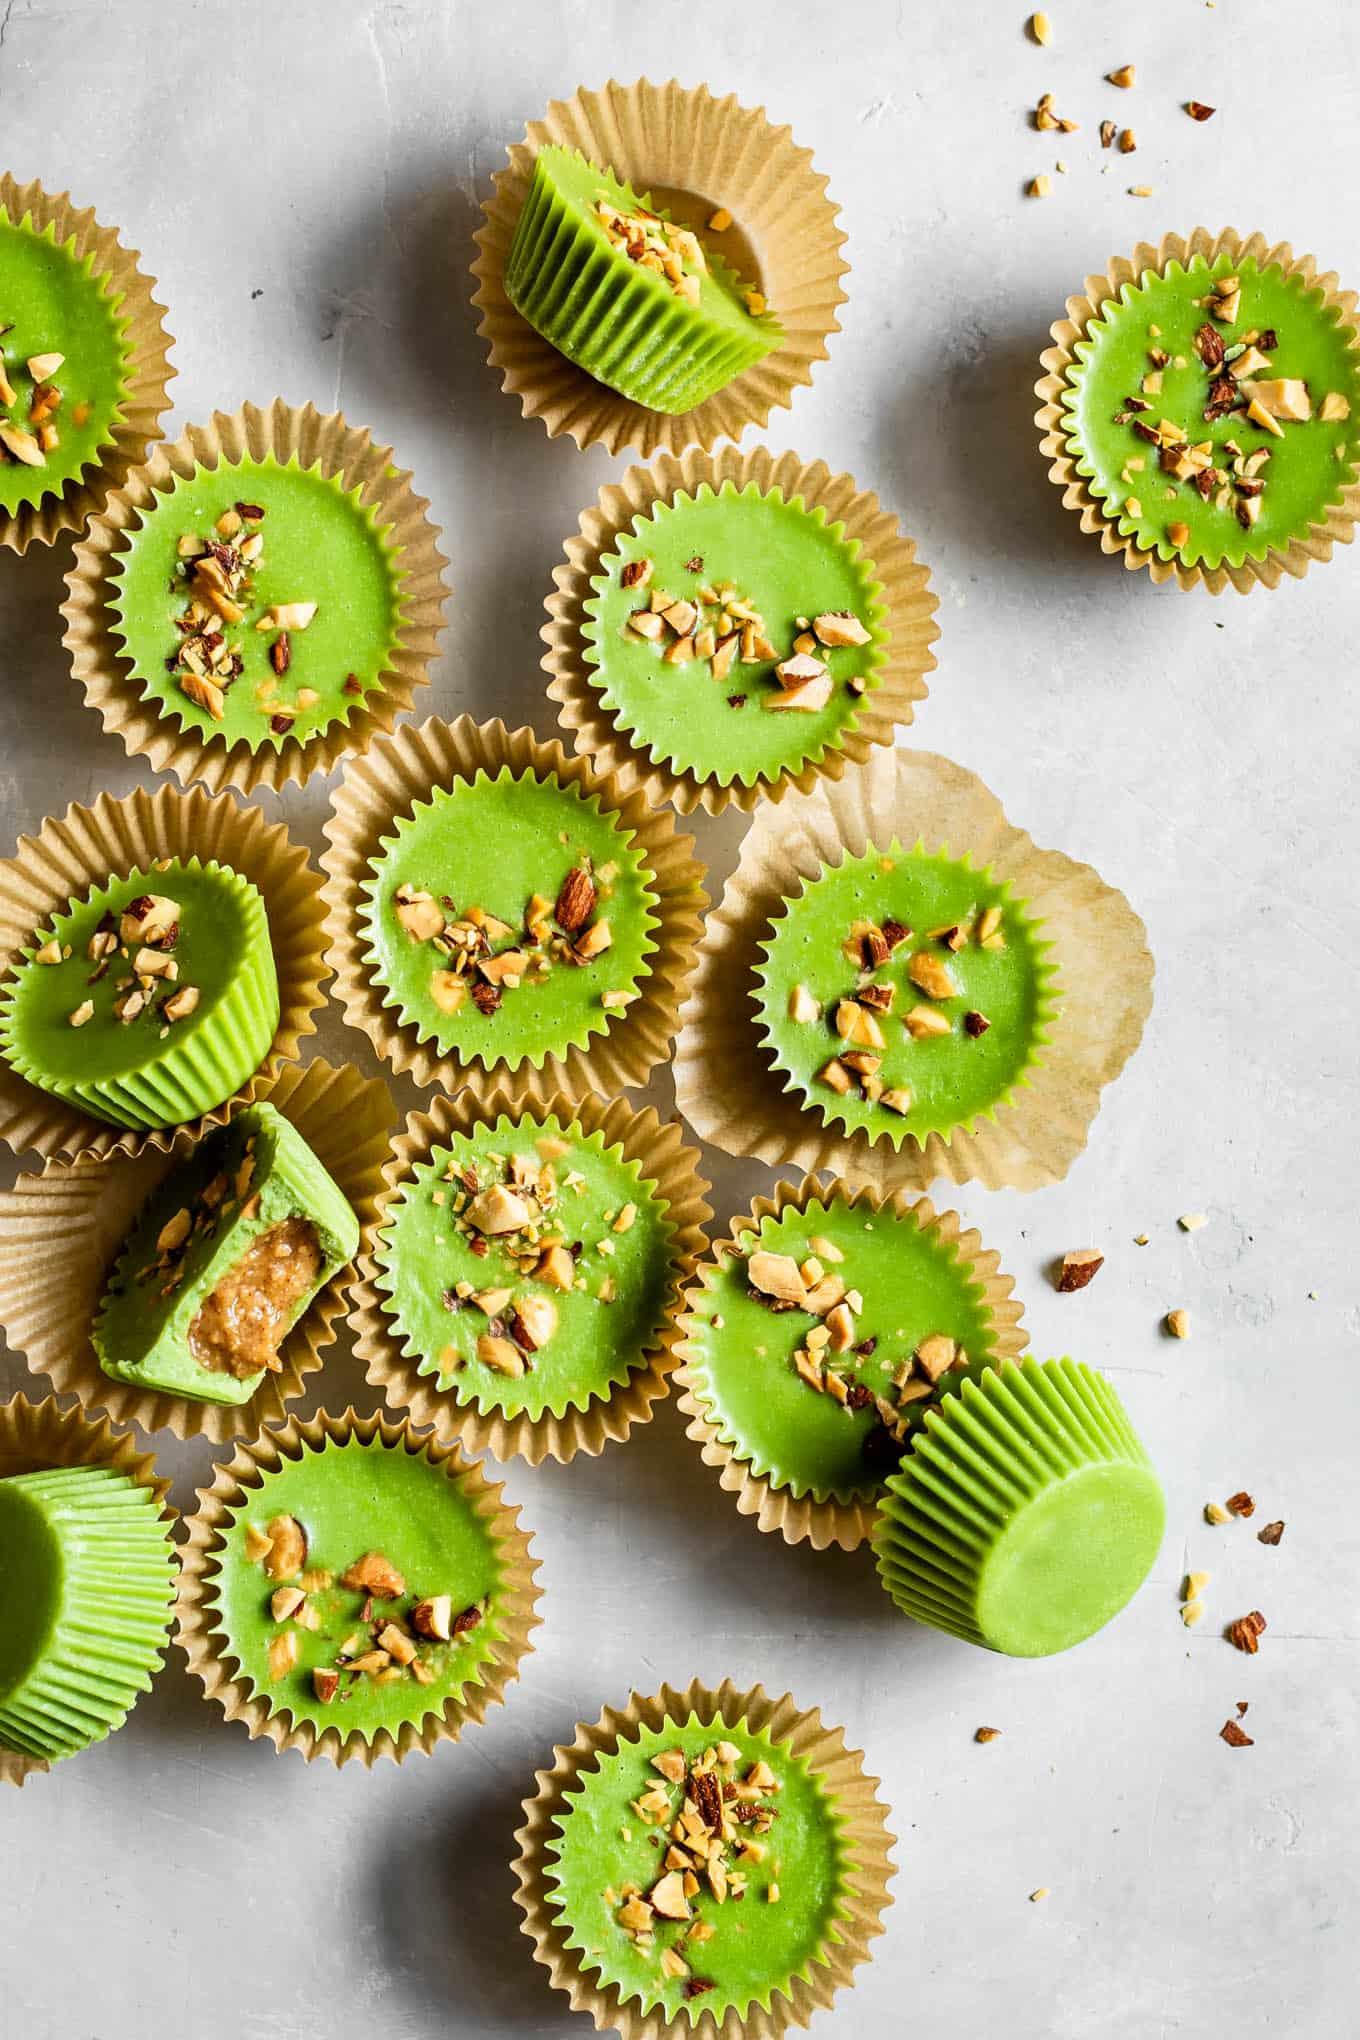 Bright Green Matcha Almond Butter Cups